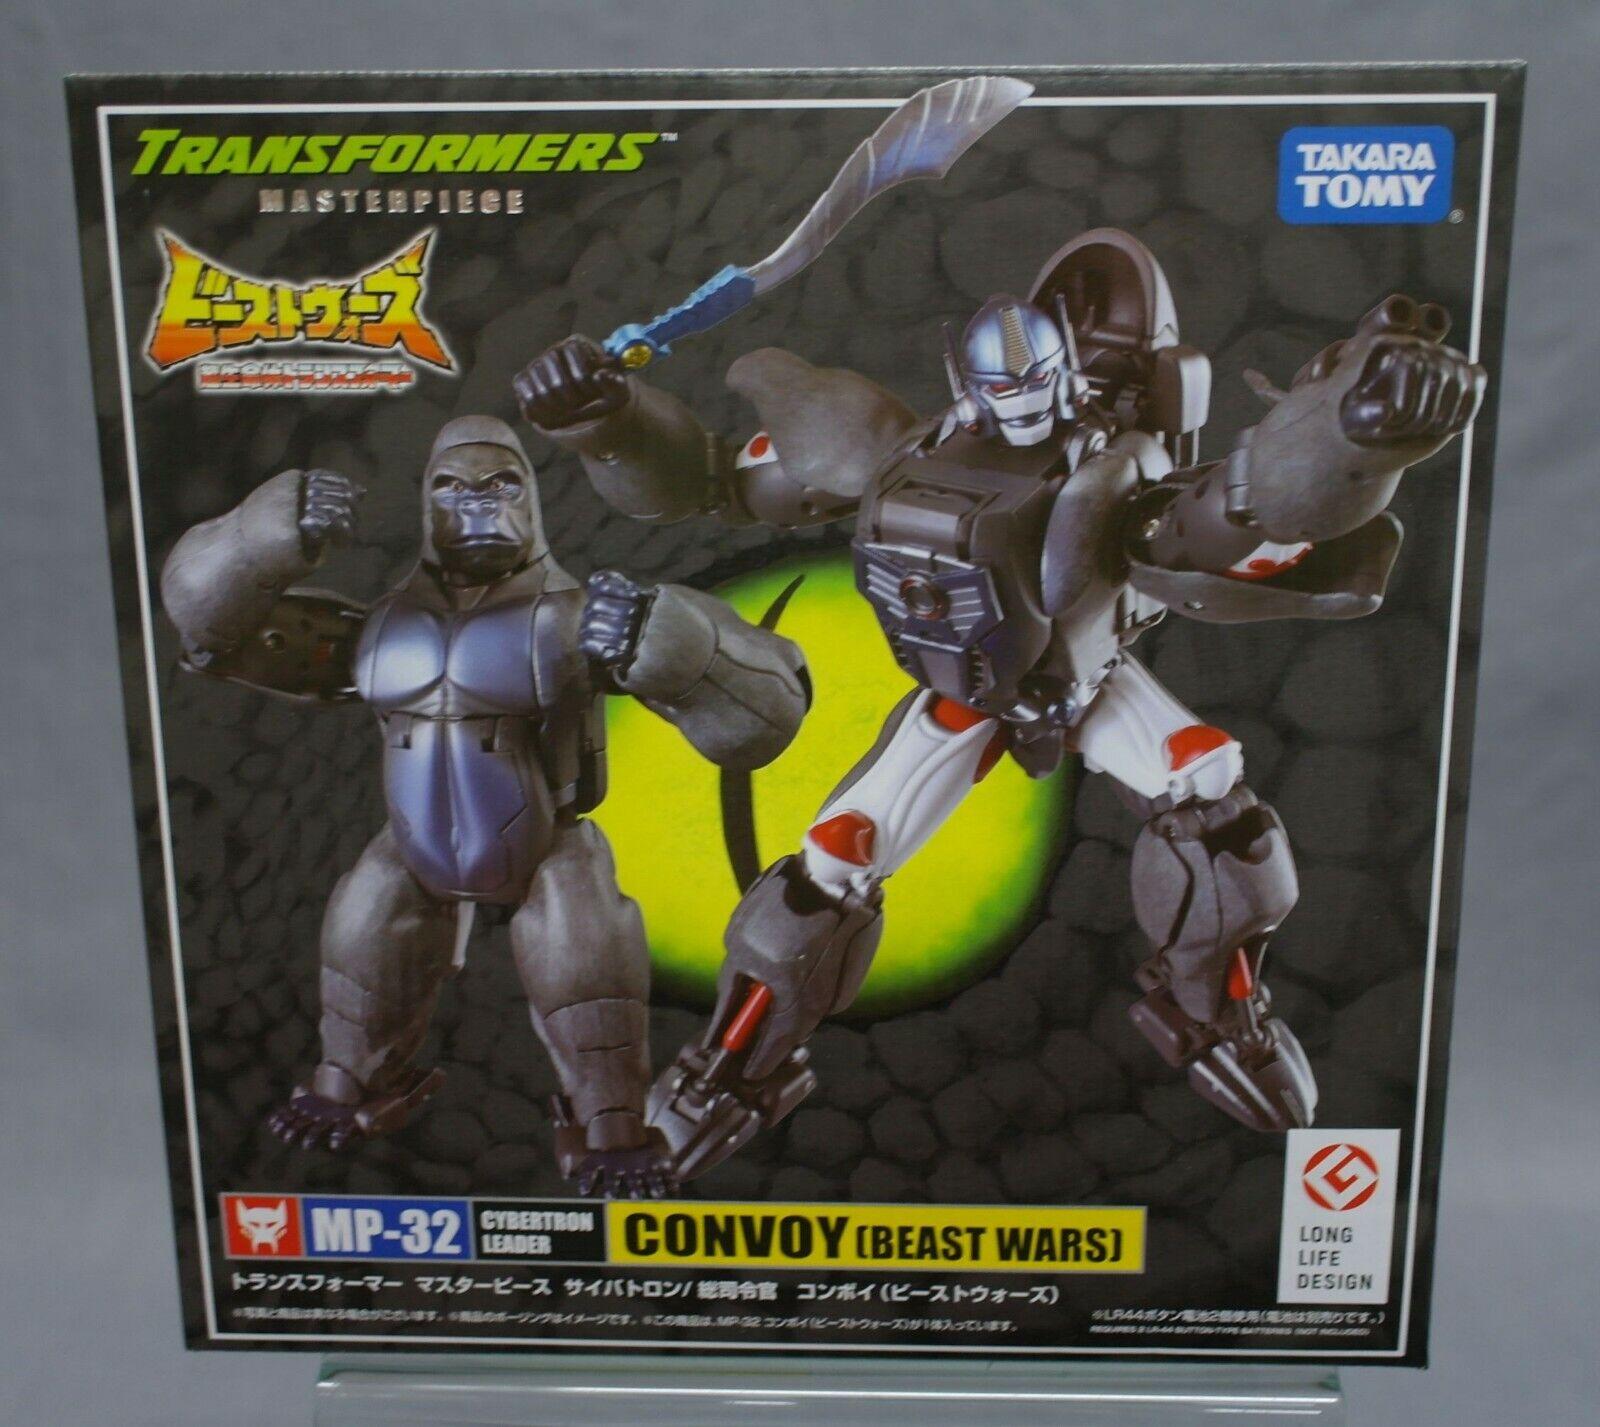 MP32 Transformers Masterpiece Convoy (Beast Wars) Japan New (c)